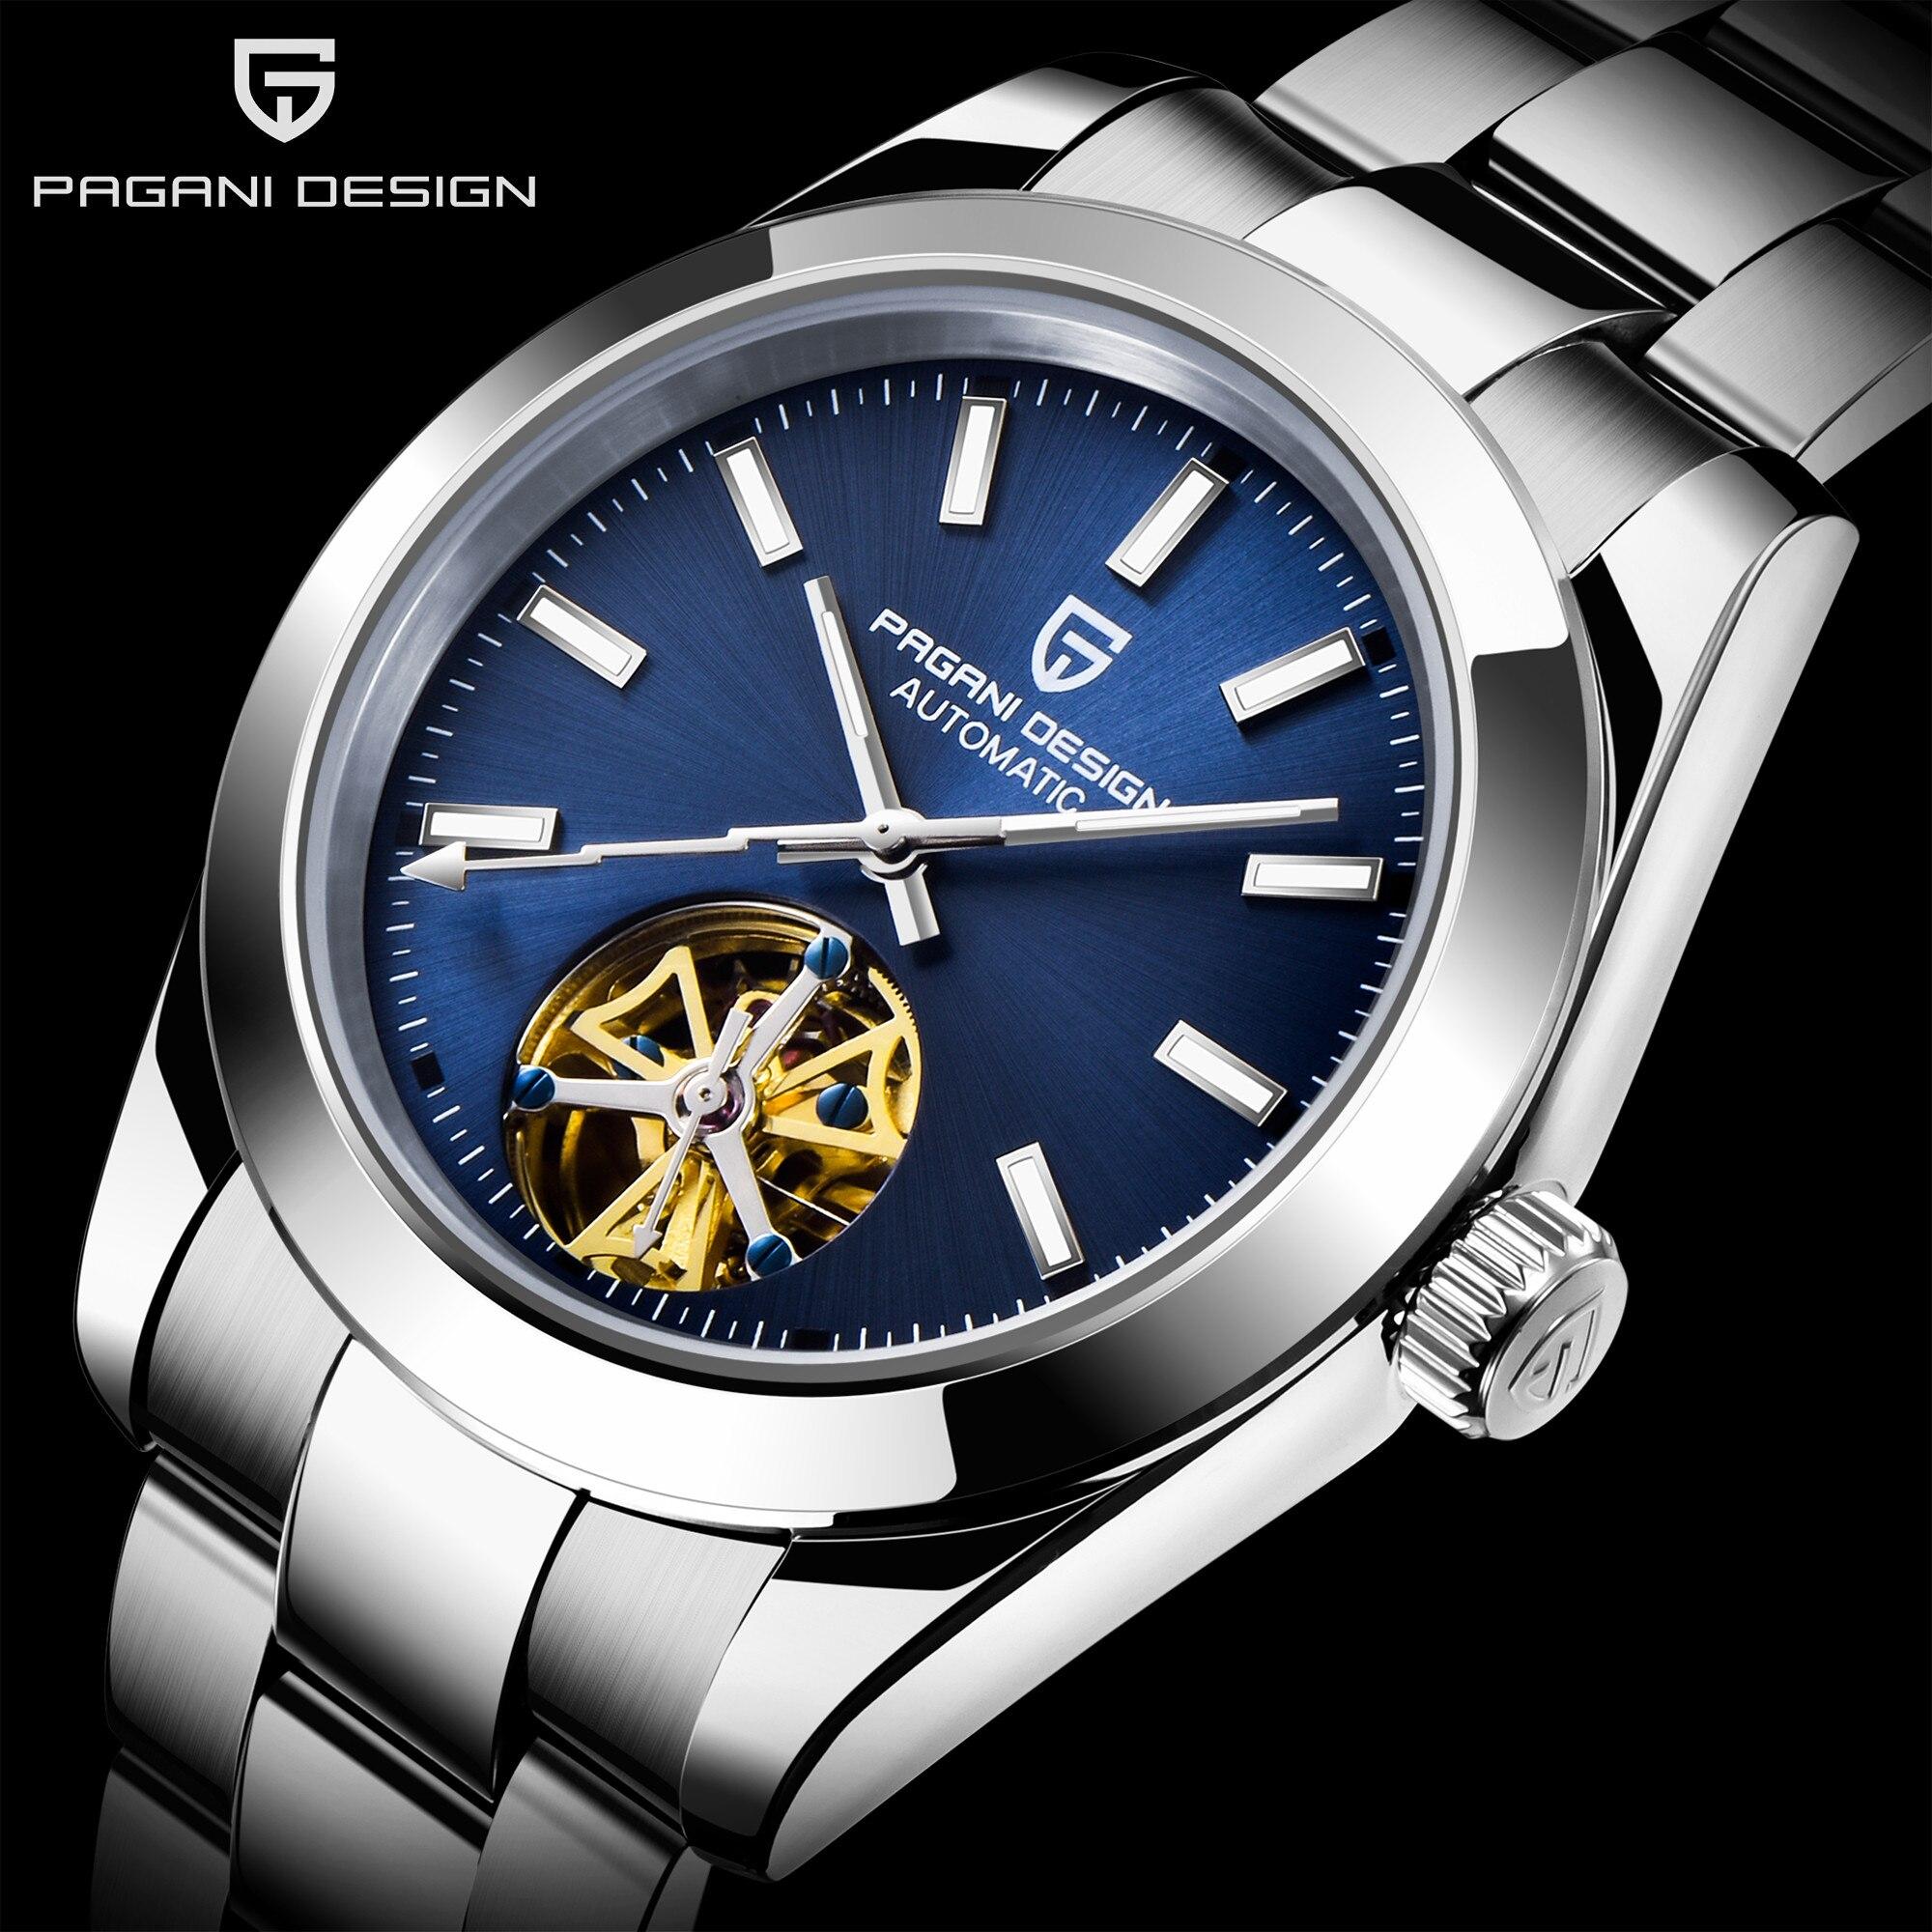 Relojes de negocios PAGANI, Tourbillon mecánico automático para hombre, reloj azul oscuro de la mejor marca, reloj deportivo impermeable de 100M para hombres